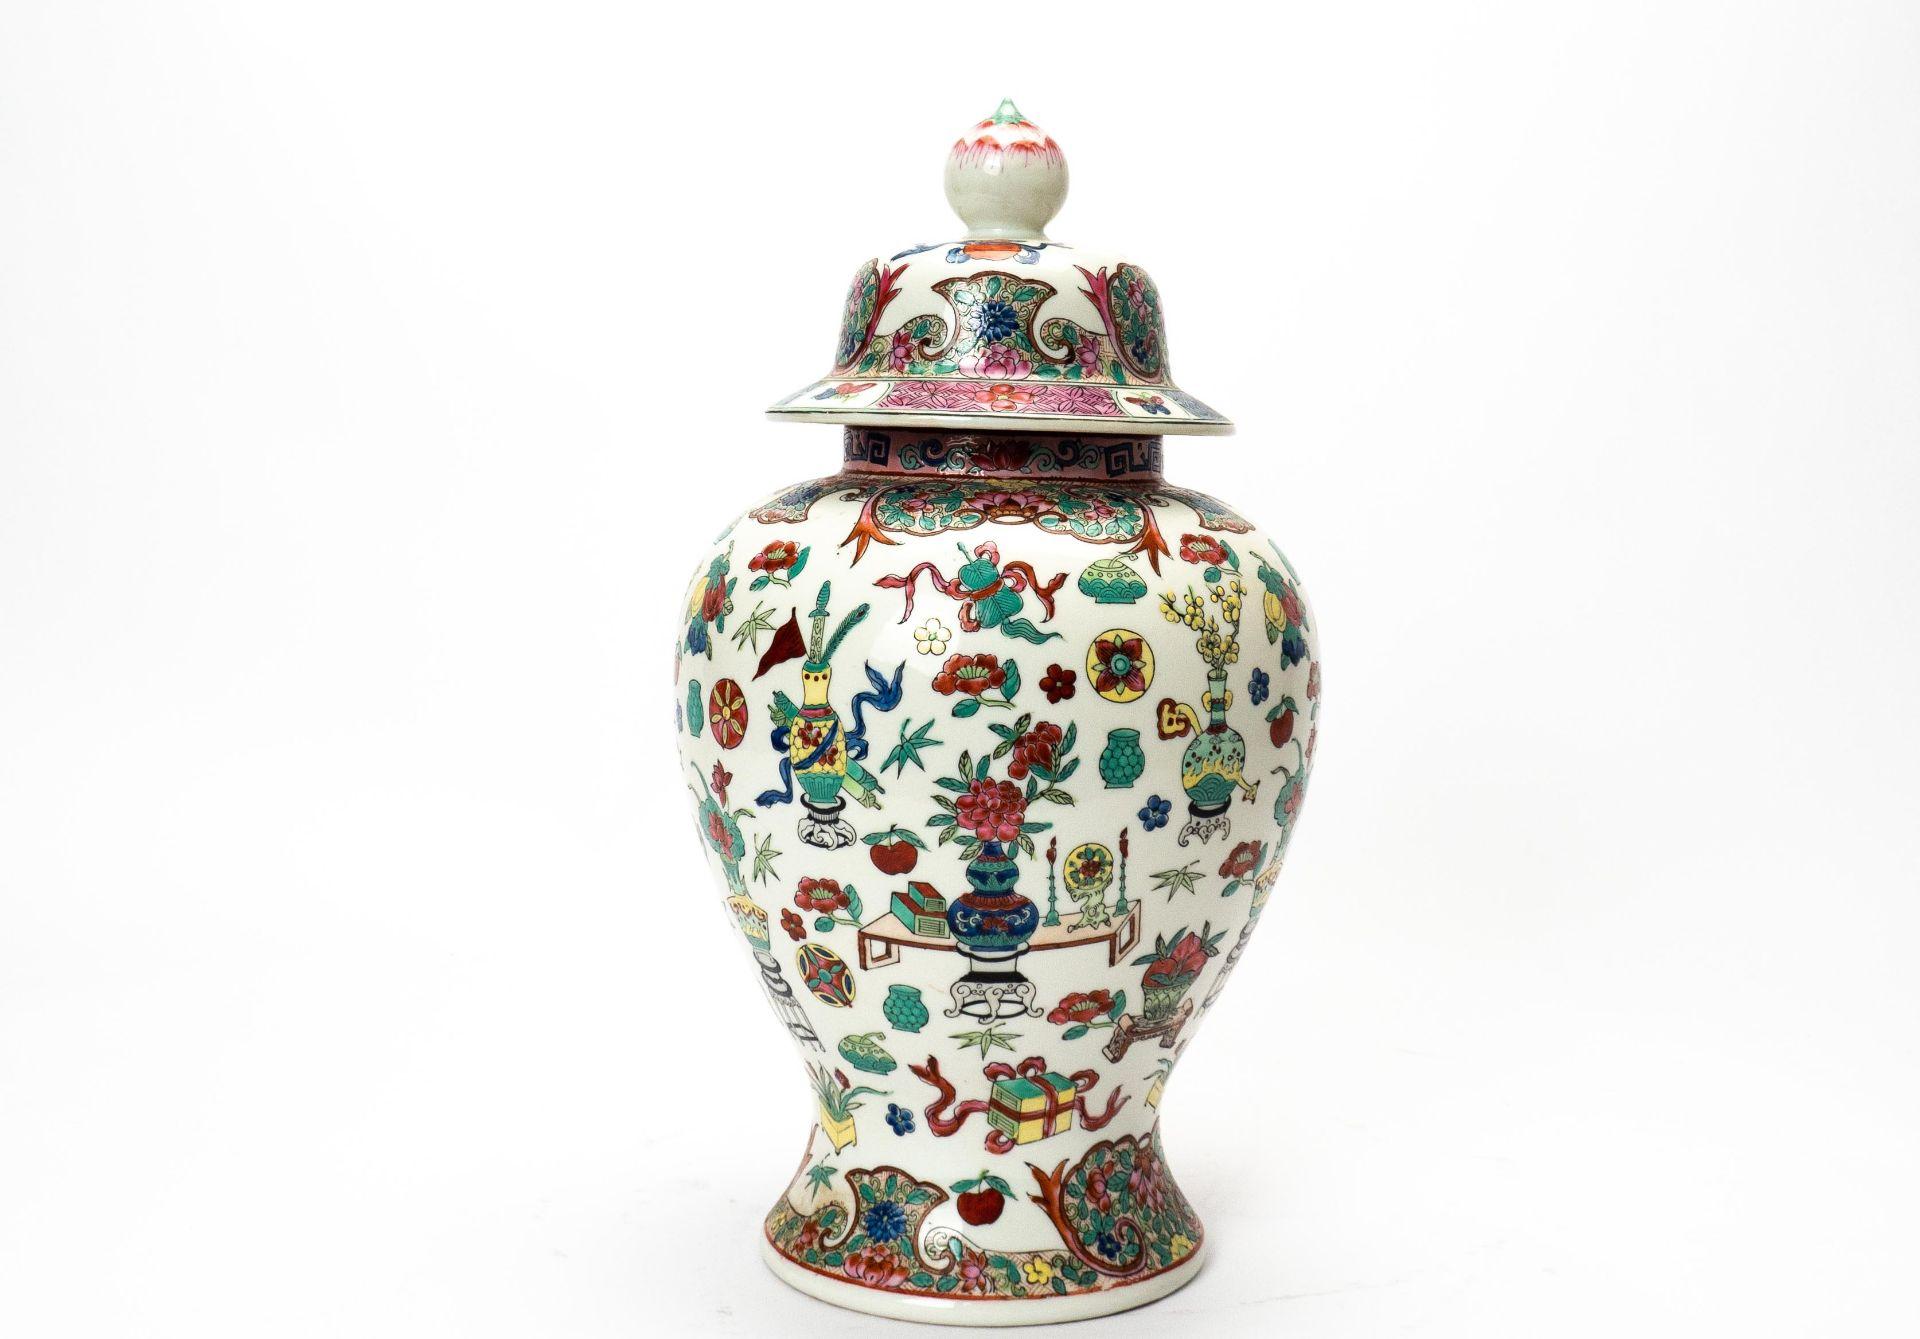 Deckelvase China - Image 3 of 5